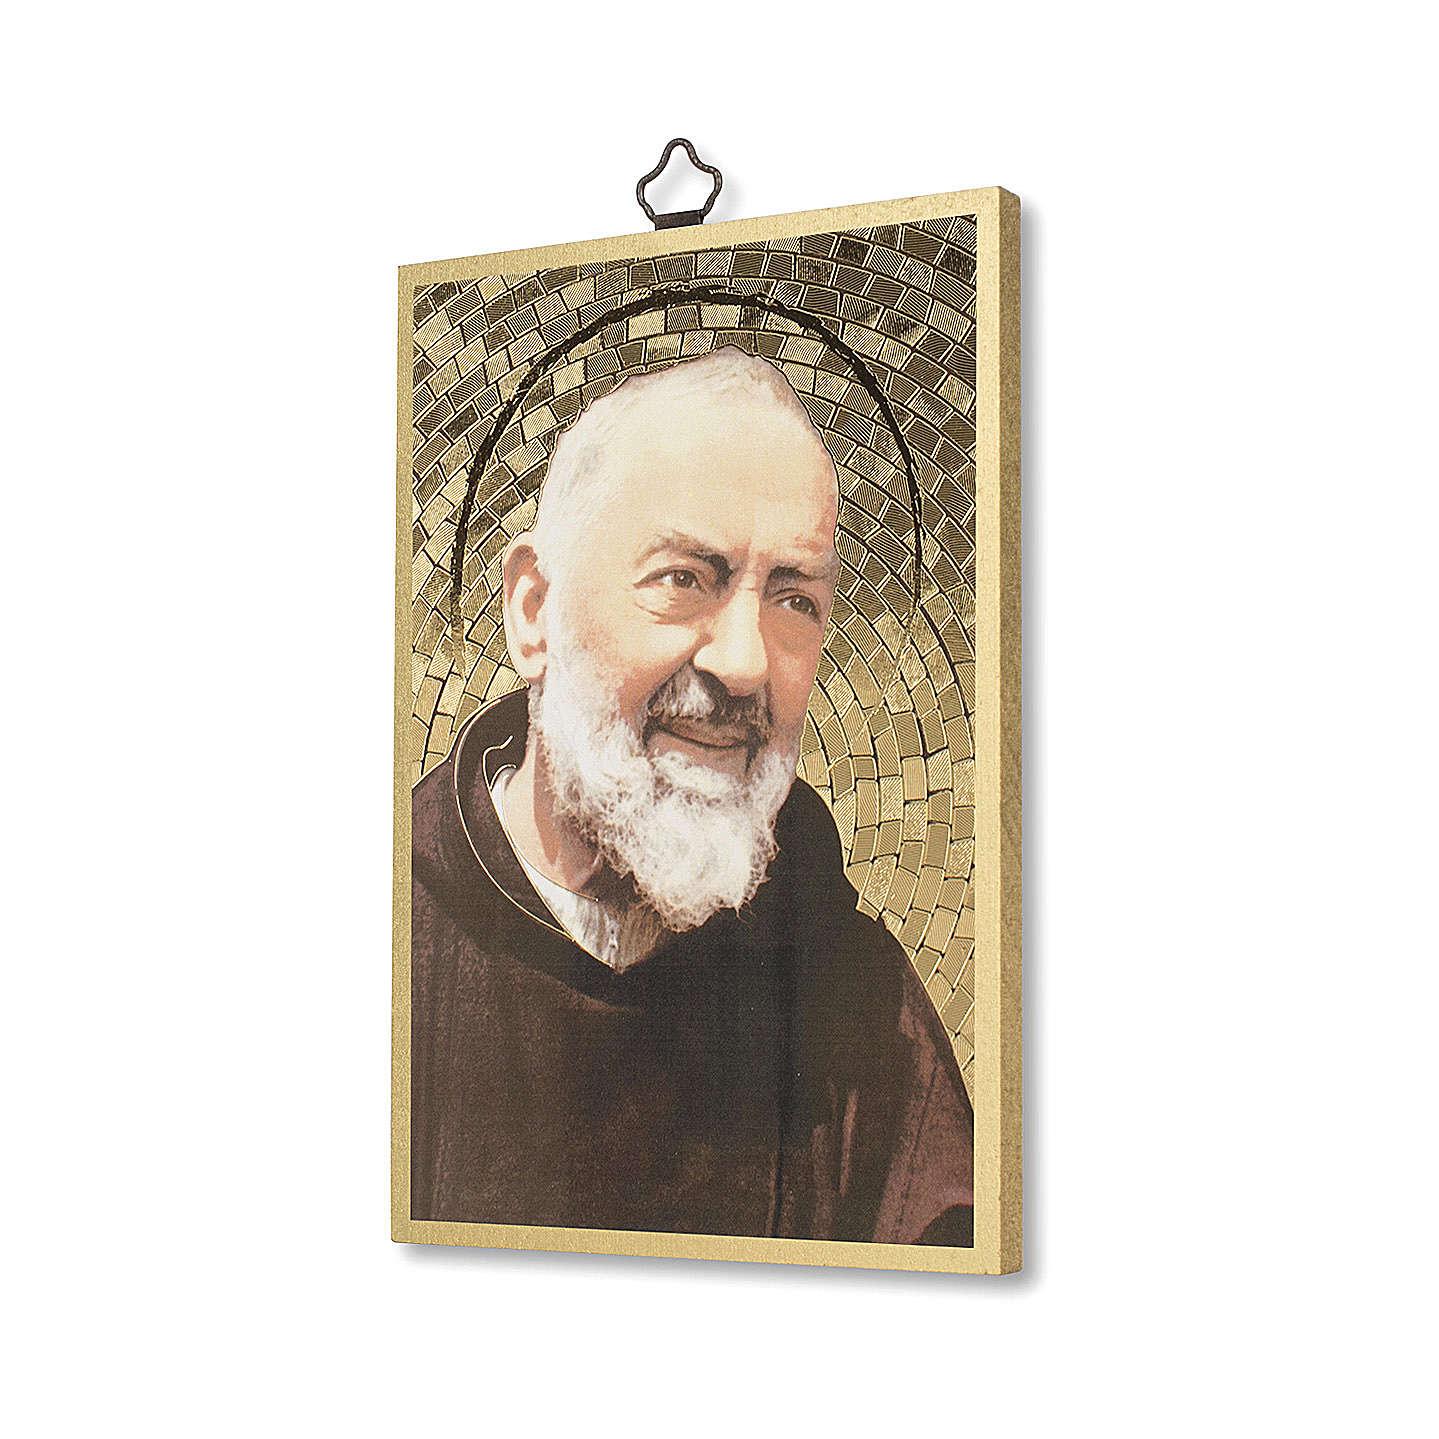 Saint Pio woodcut 3